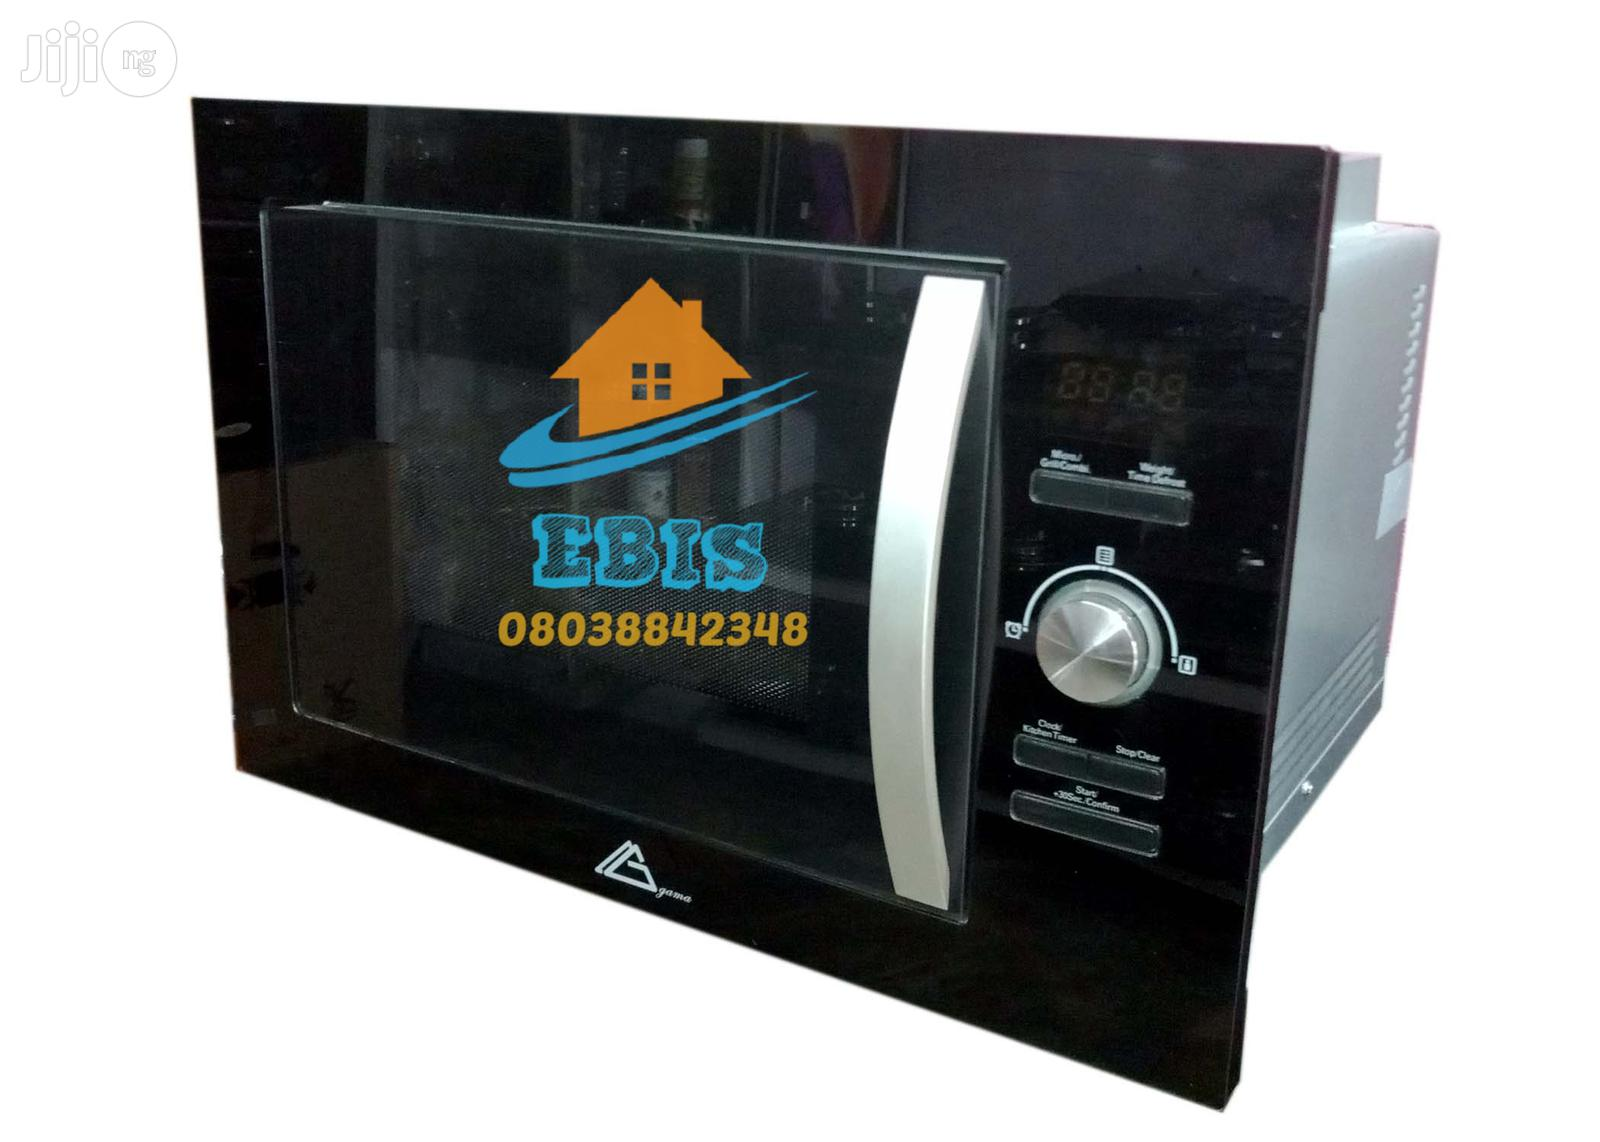 Built-In Microwave (Gama)